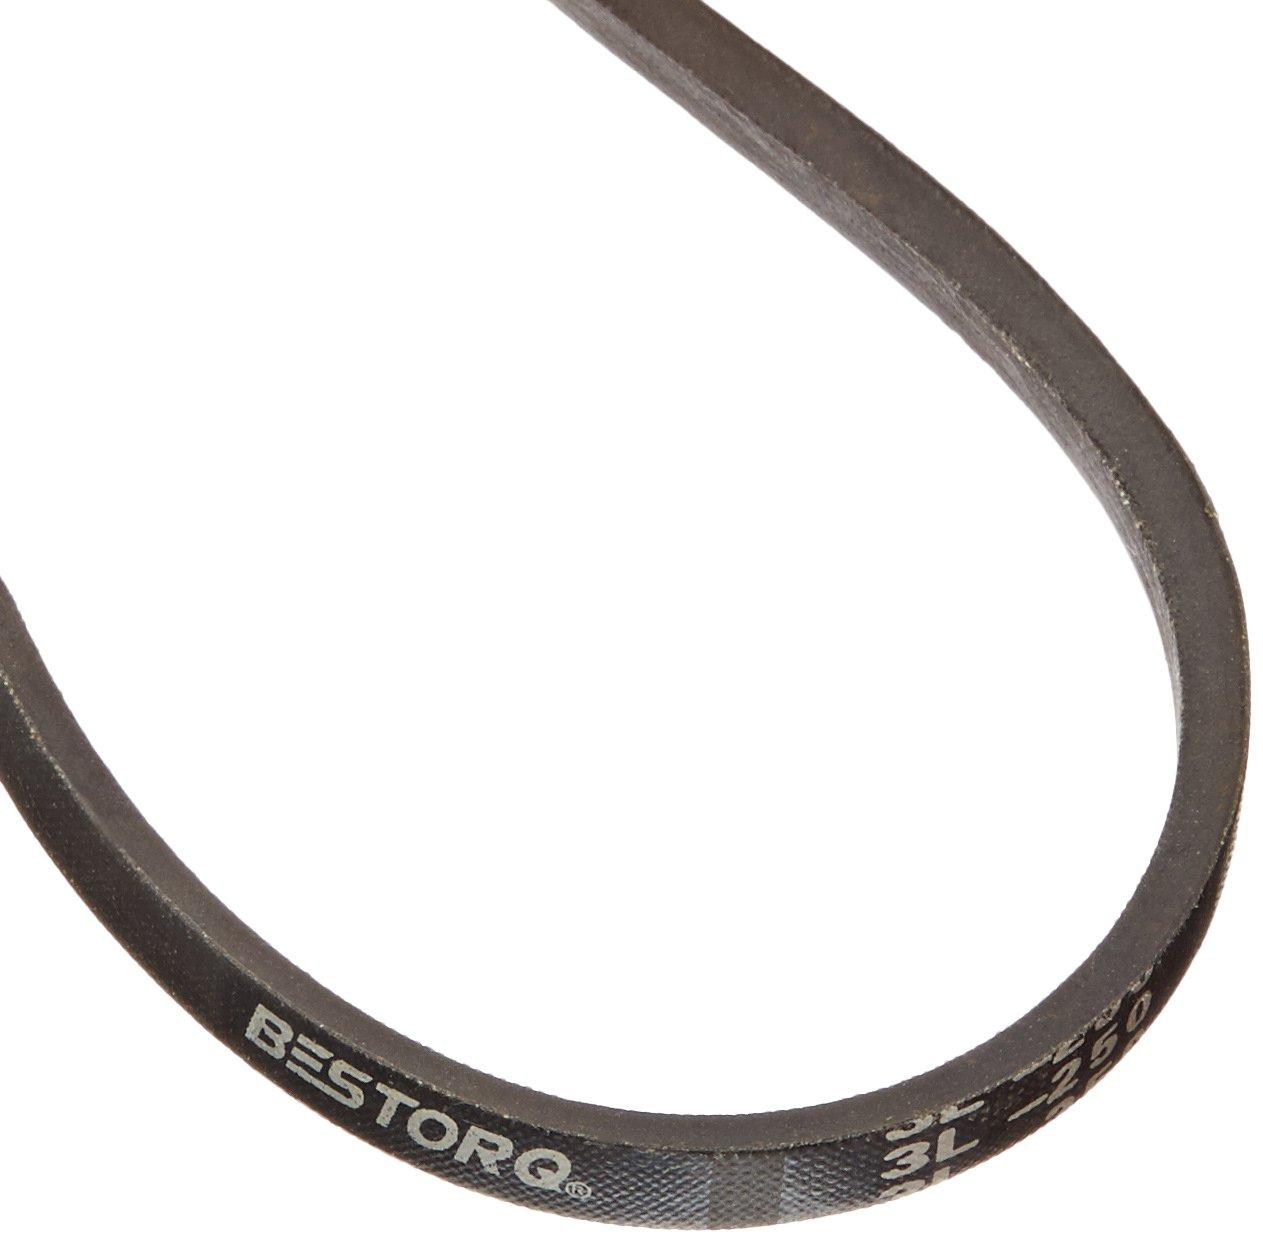 BESTORQ 3L250 Rubber V-Belt 25 Length x 0.375 Width x 0.23 Height Black Wrapped